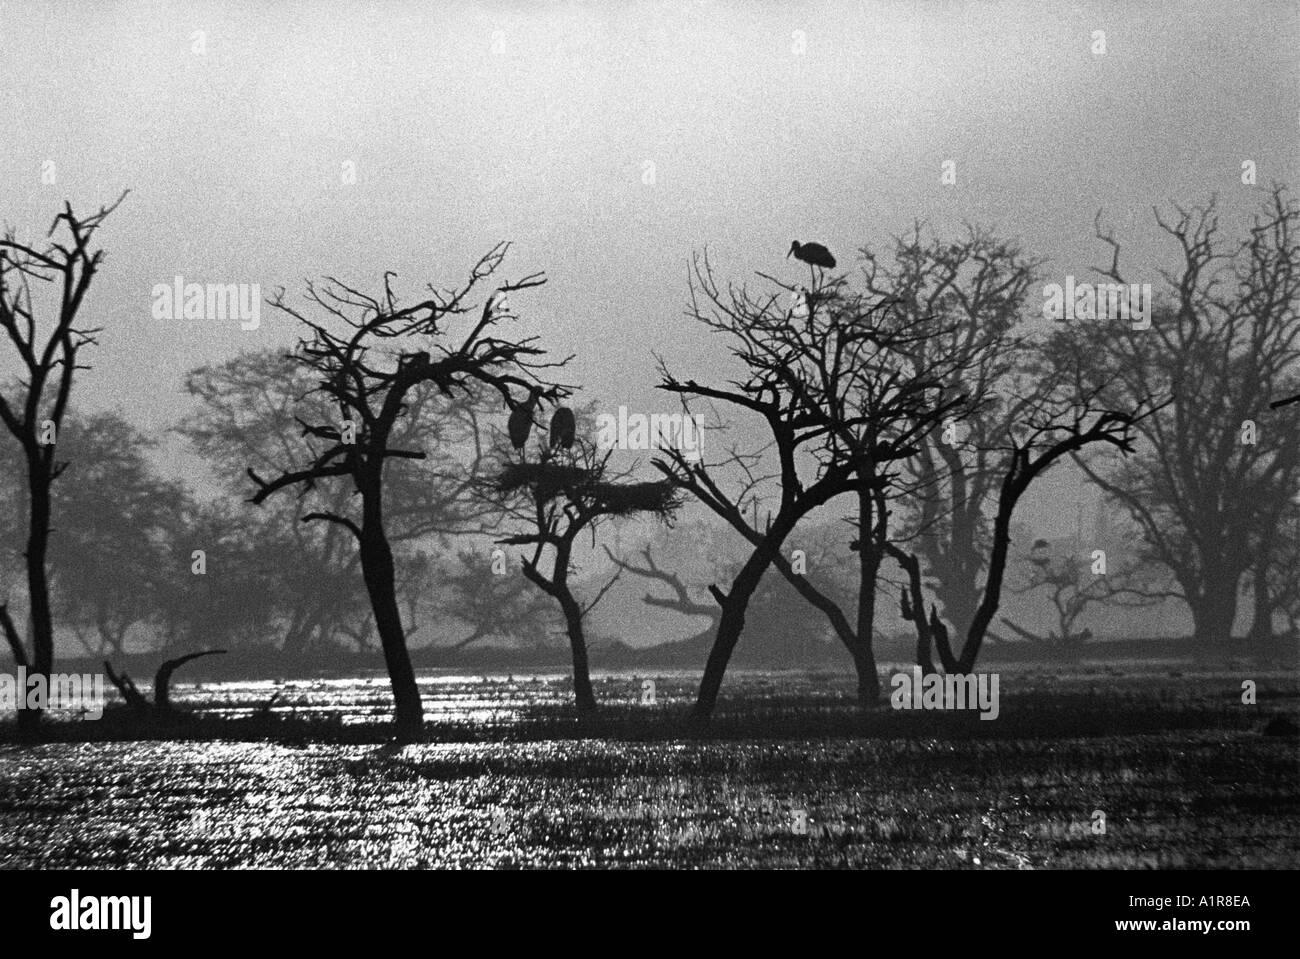 birds nesting on trees in swamp at Sunrise at Bharatpur Keoladev Bird Sanctuary Rajasthan India - Stock Image